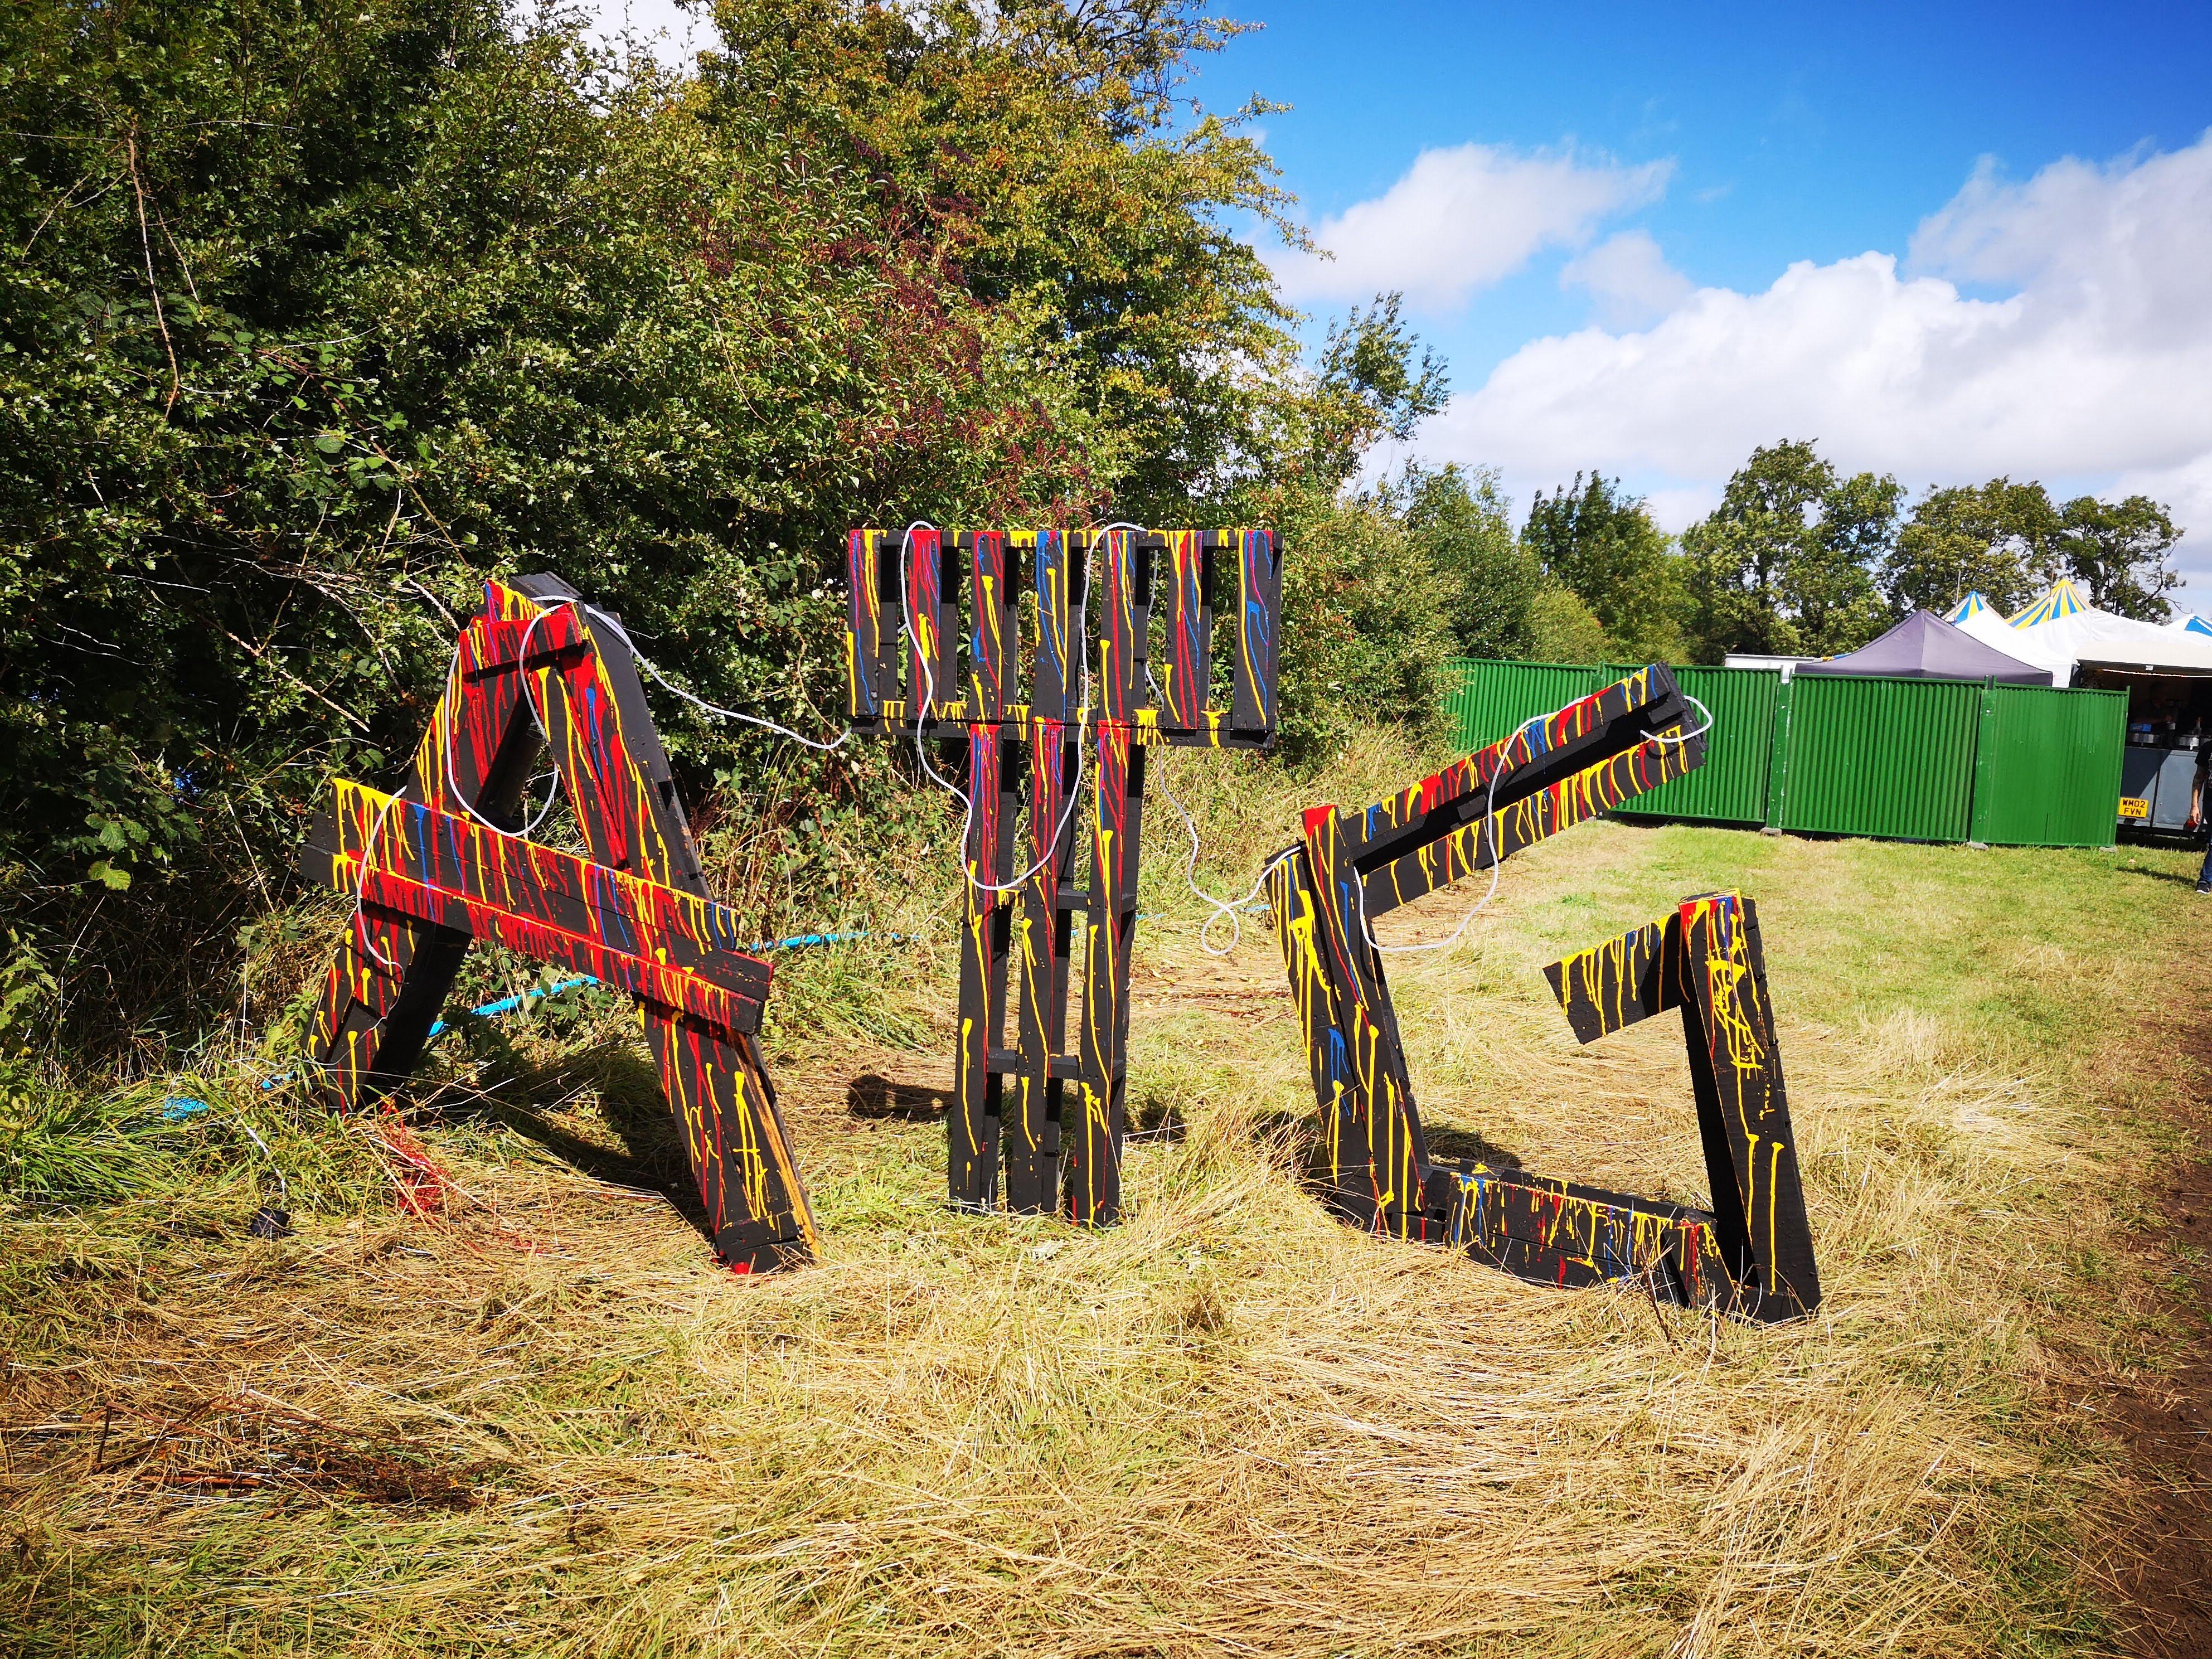 Festival Review – ArcTanGent Festival 2019